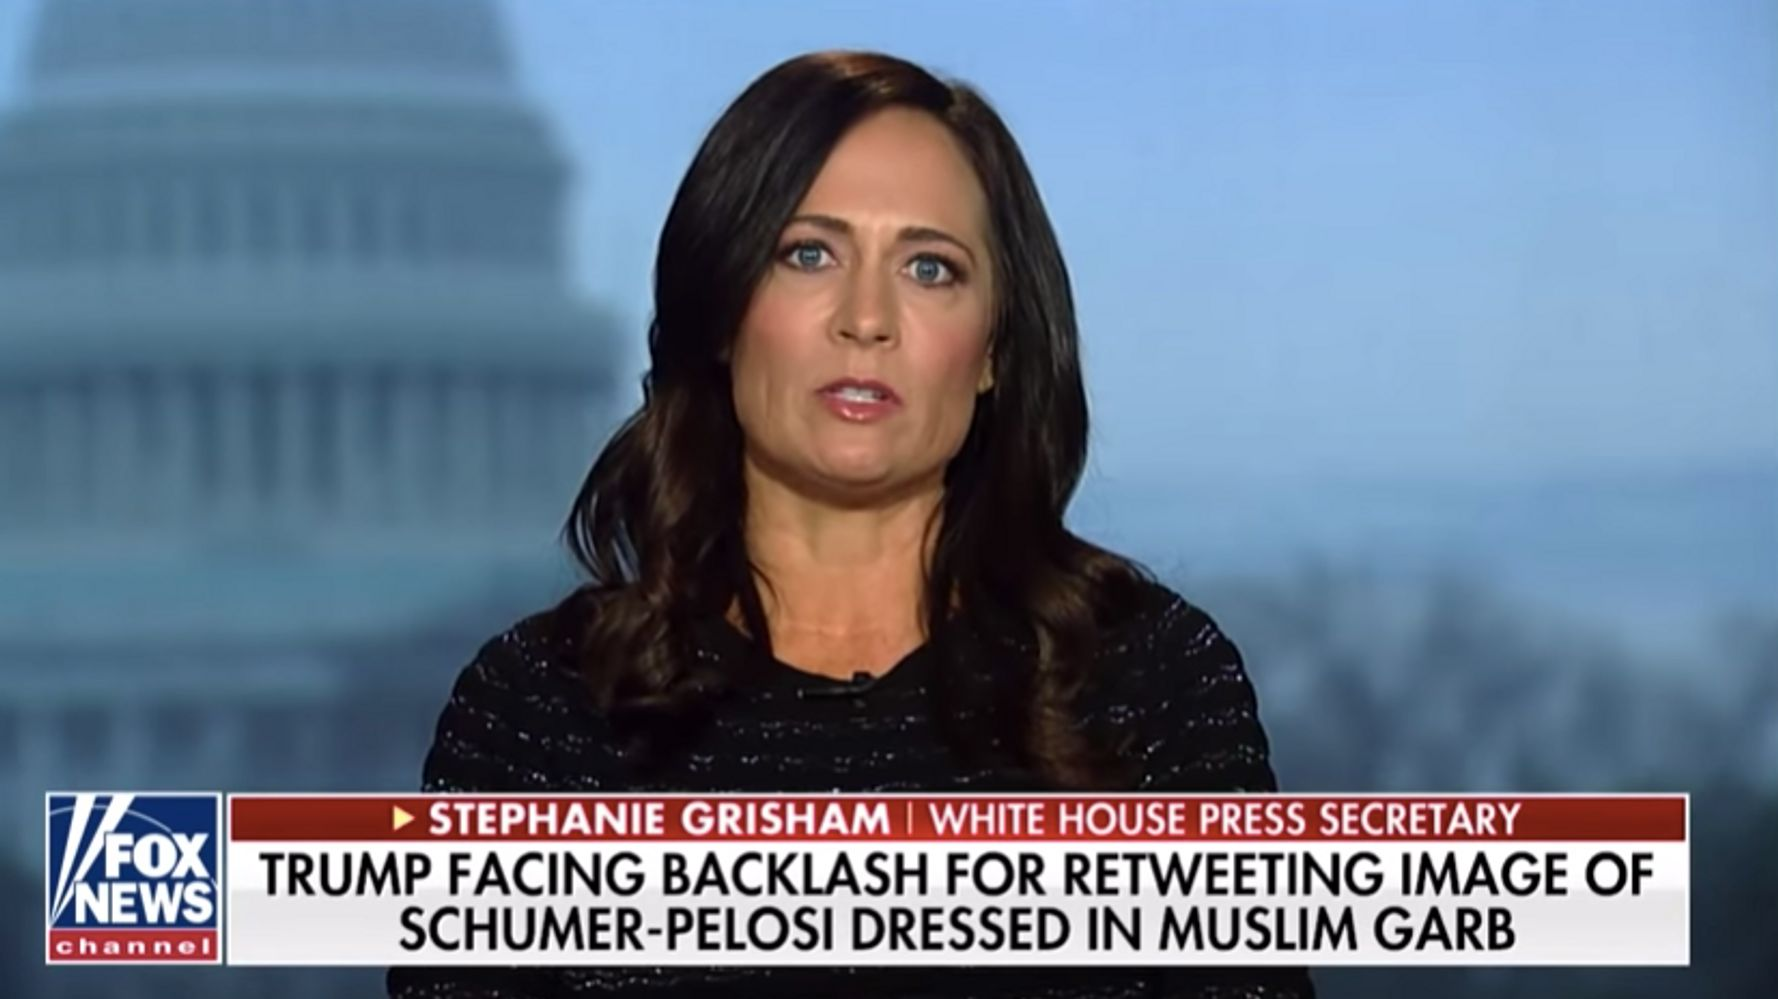 Westlake Legal Group 5e1cda6321000053001f6d10 Stephanie Grisham Peddles Outrageous Defense Of Trump's Anti-Muslim Retweet